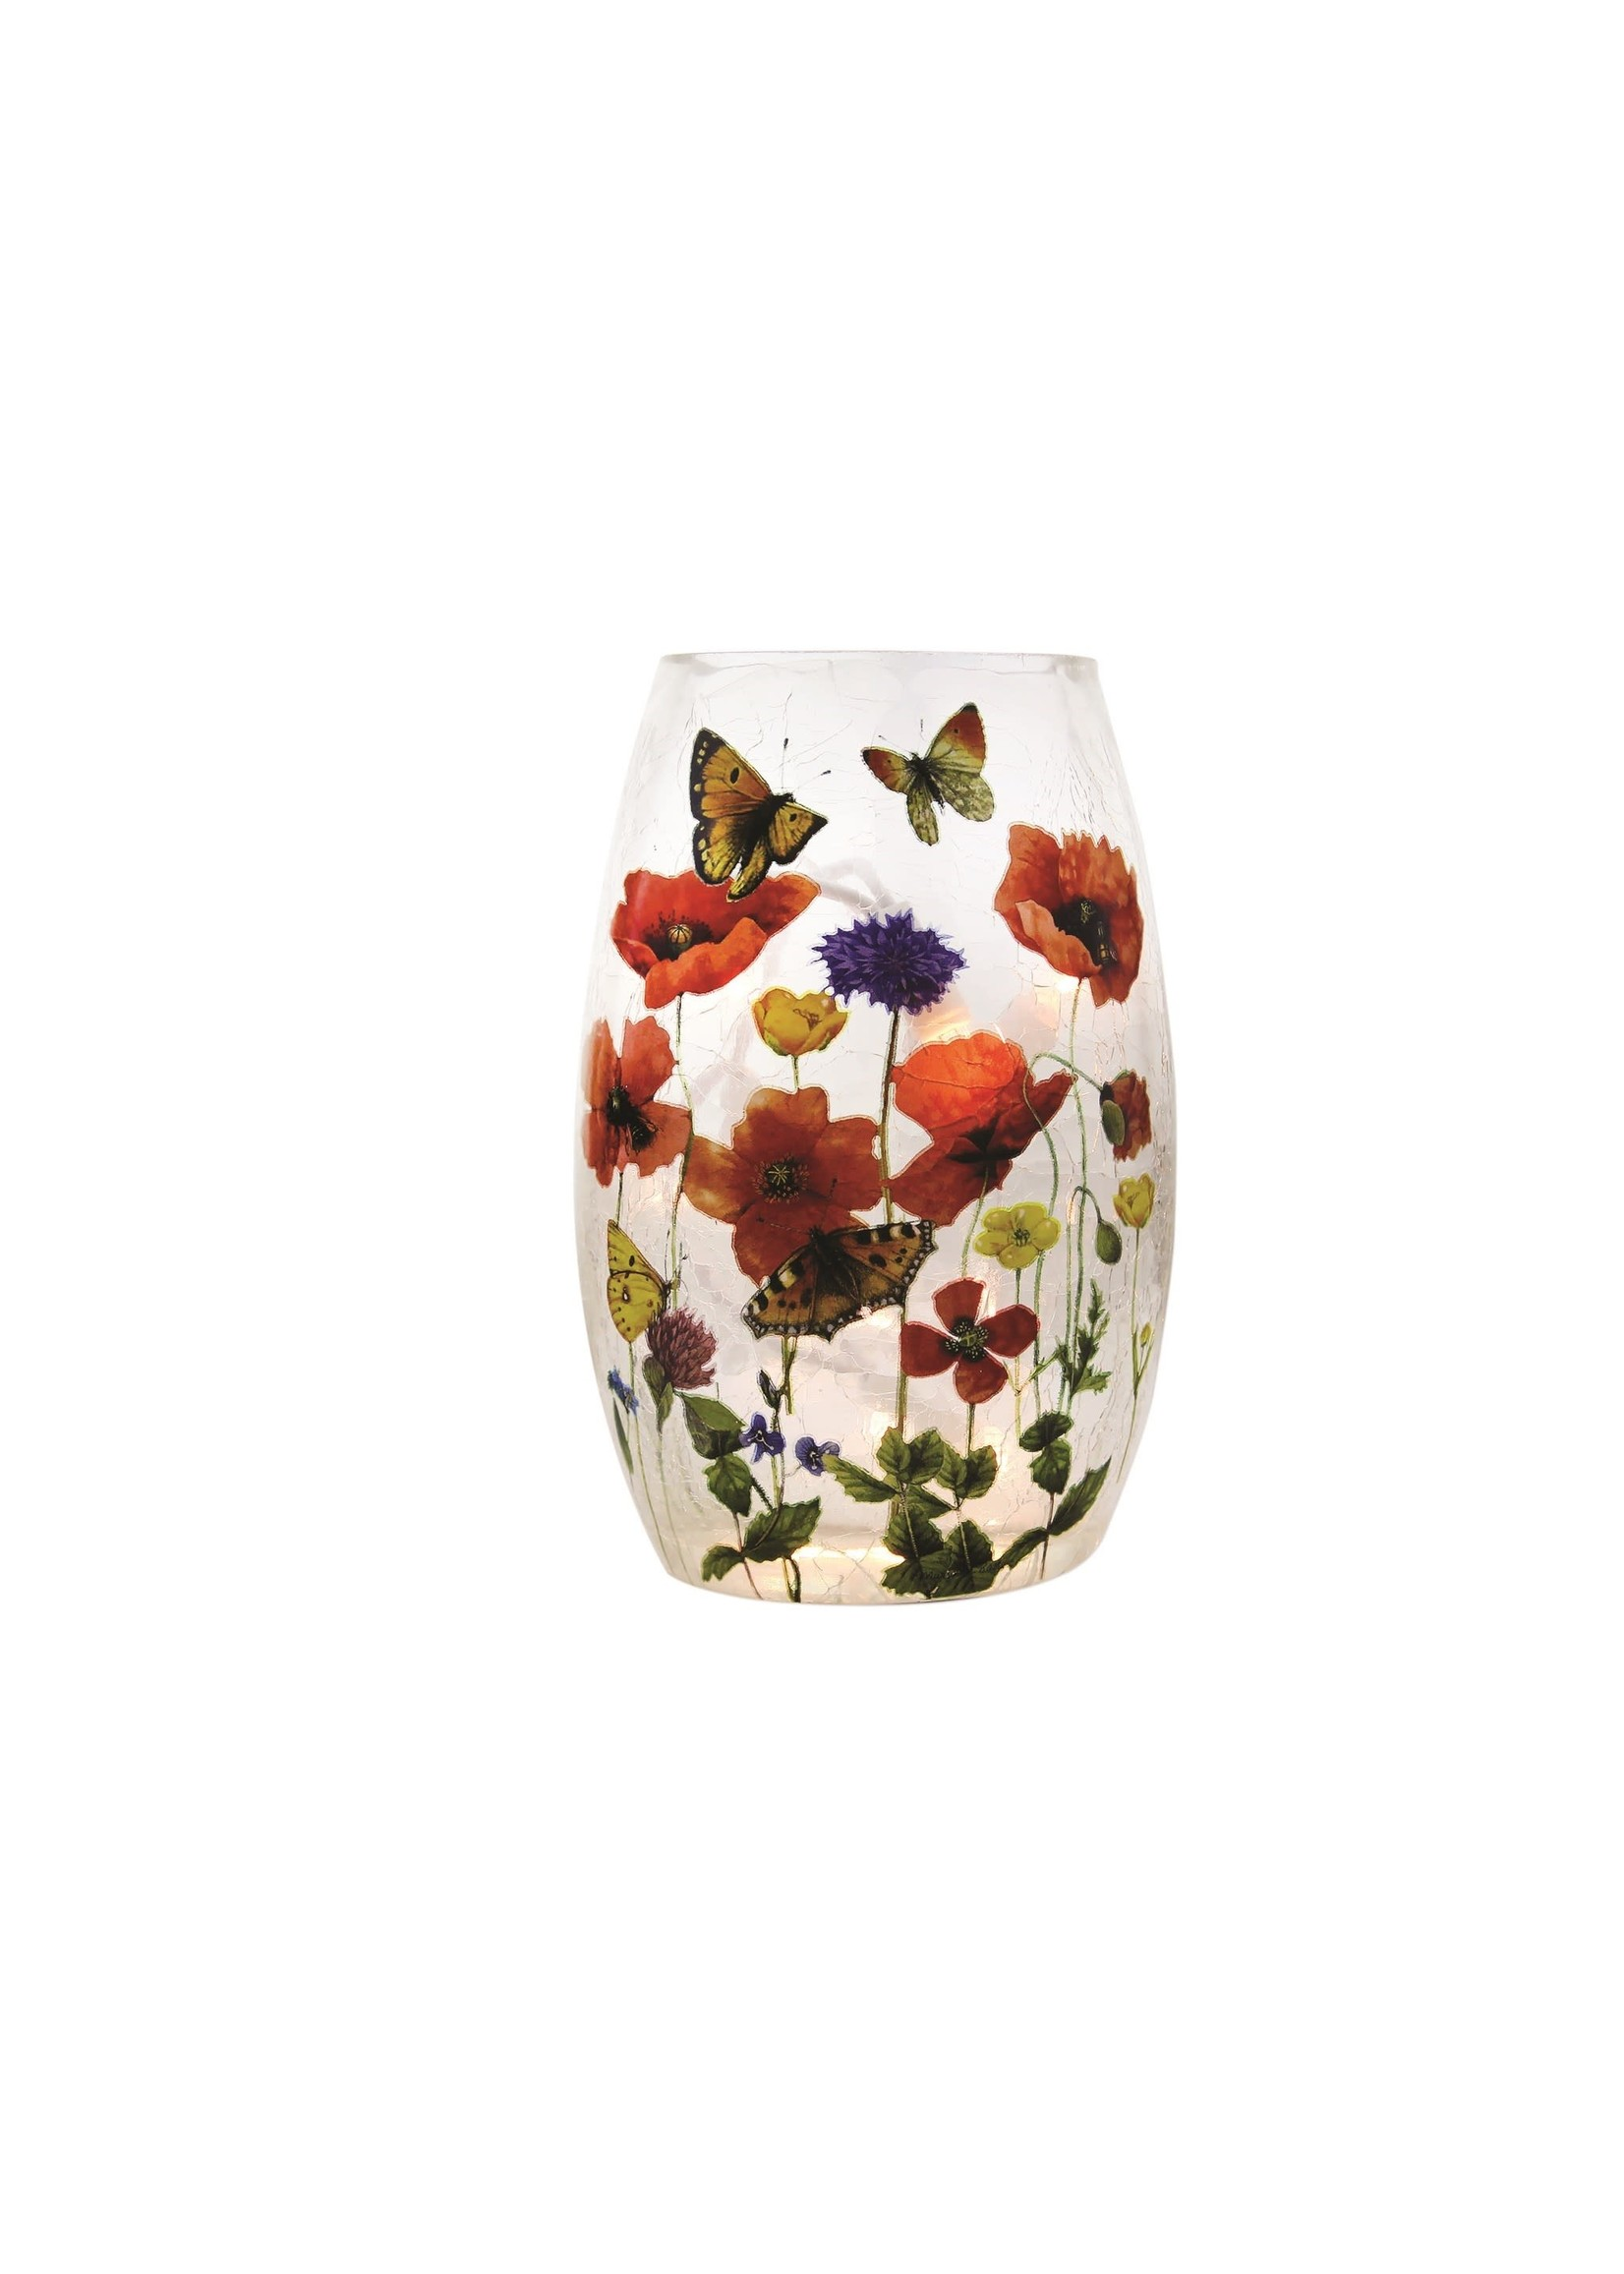 Stony Creek Flower Garden Pre-Lit Small Vase